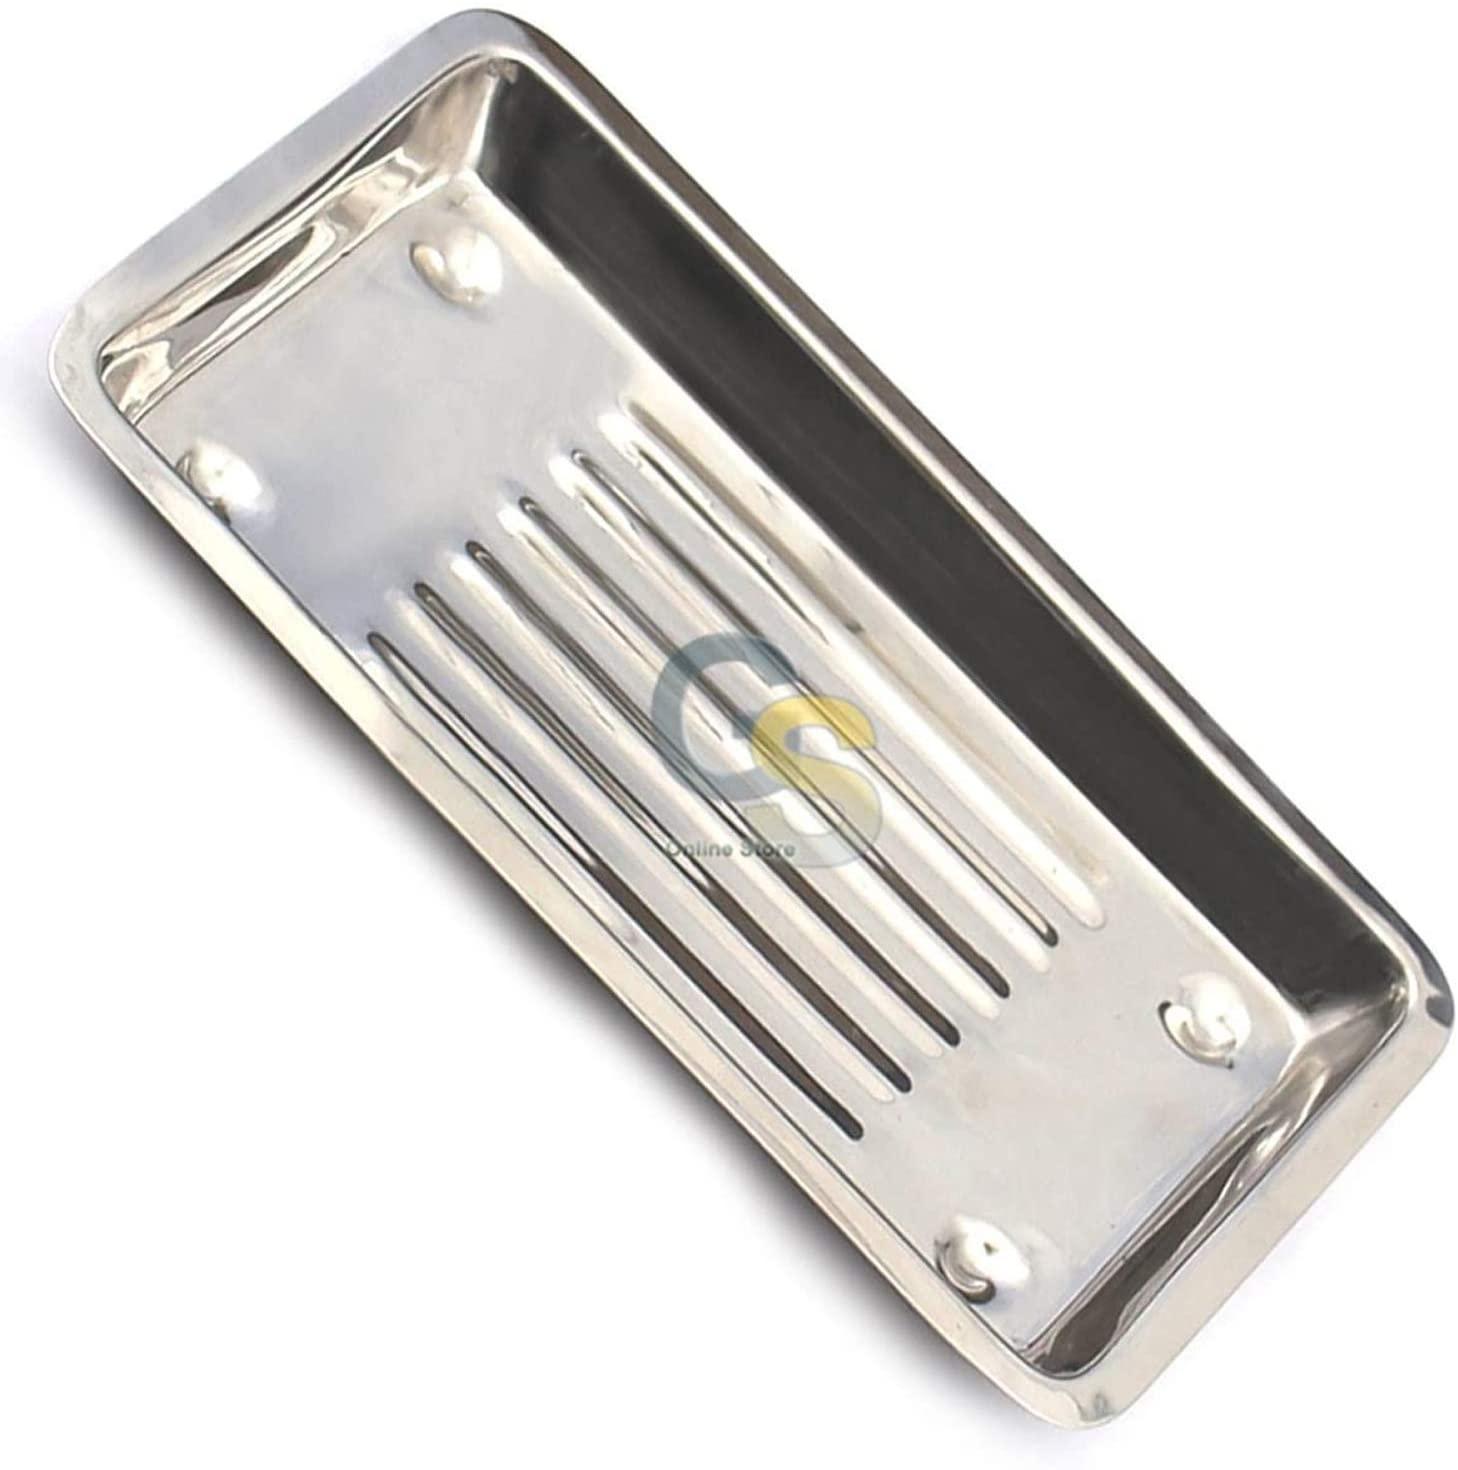 G.S SCALARS Tray Dental HOLLOWARE Best Quality